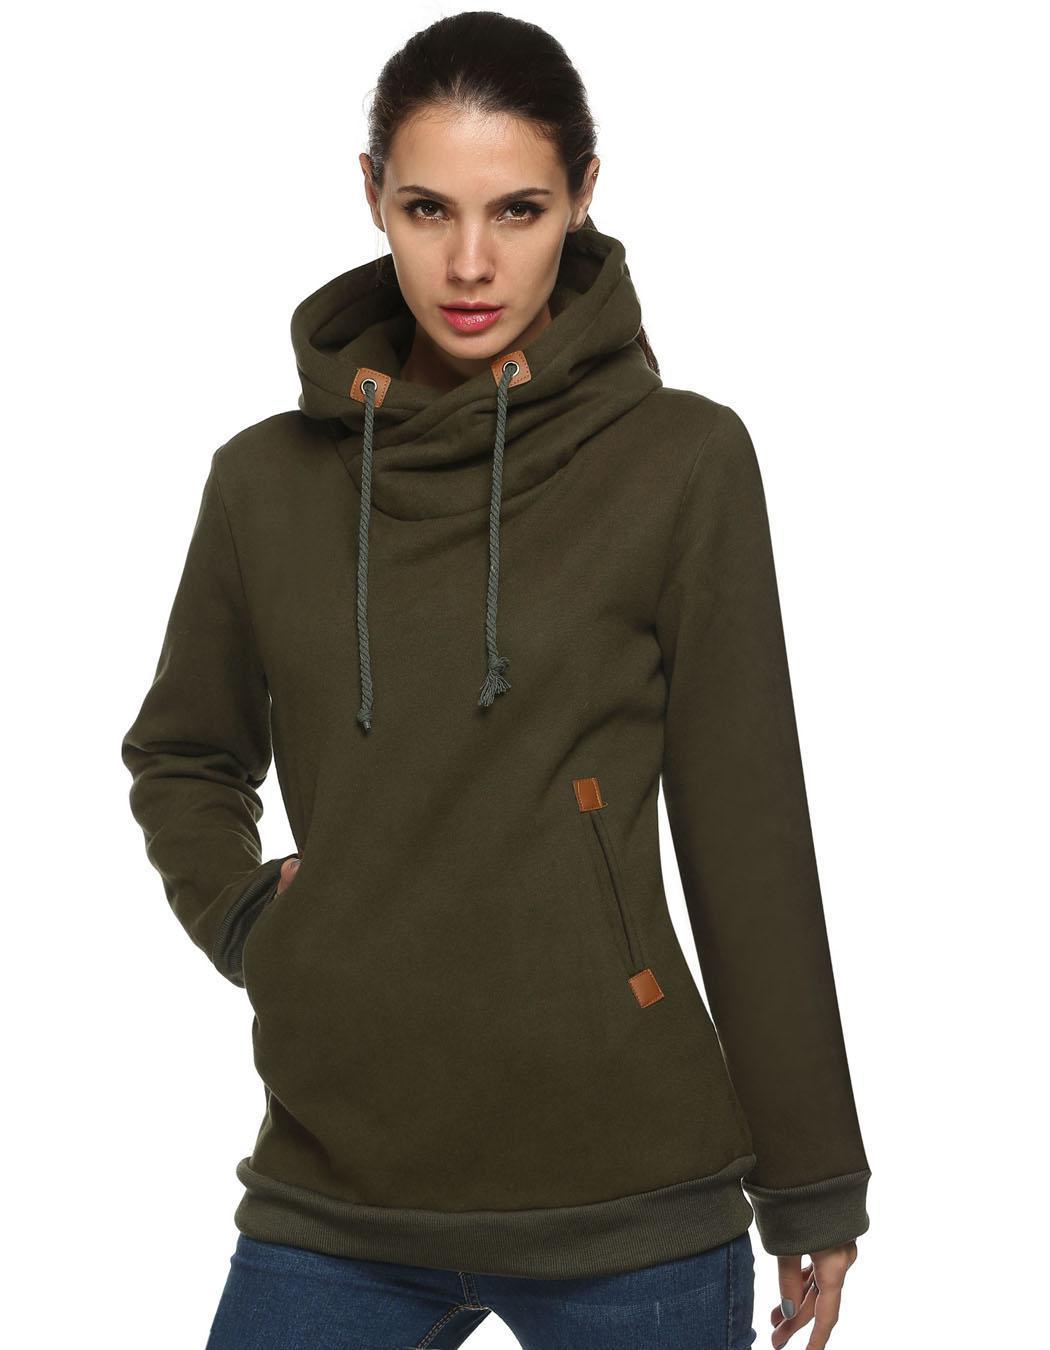 Women Long Sleeve Casual Pullover Hooded Sweatershirt Hoodies 0